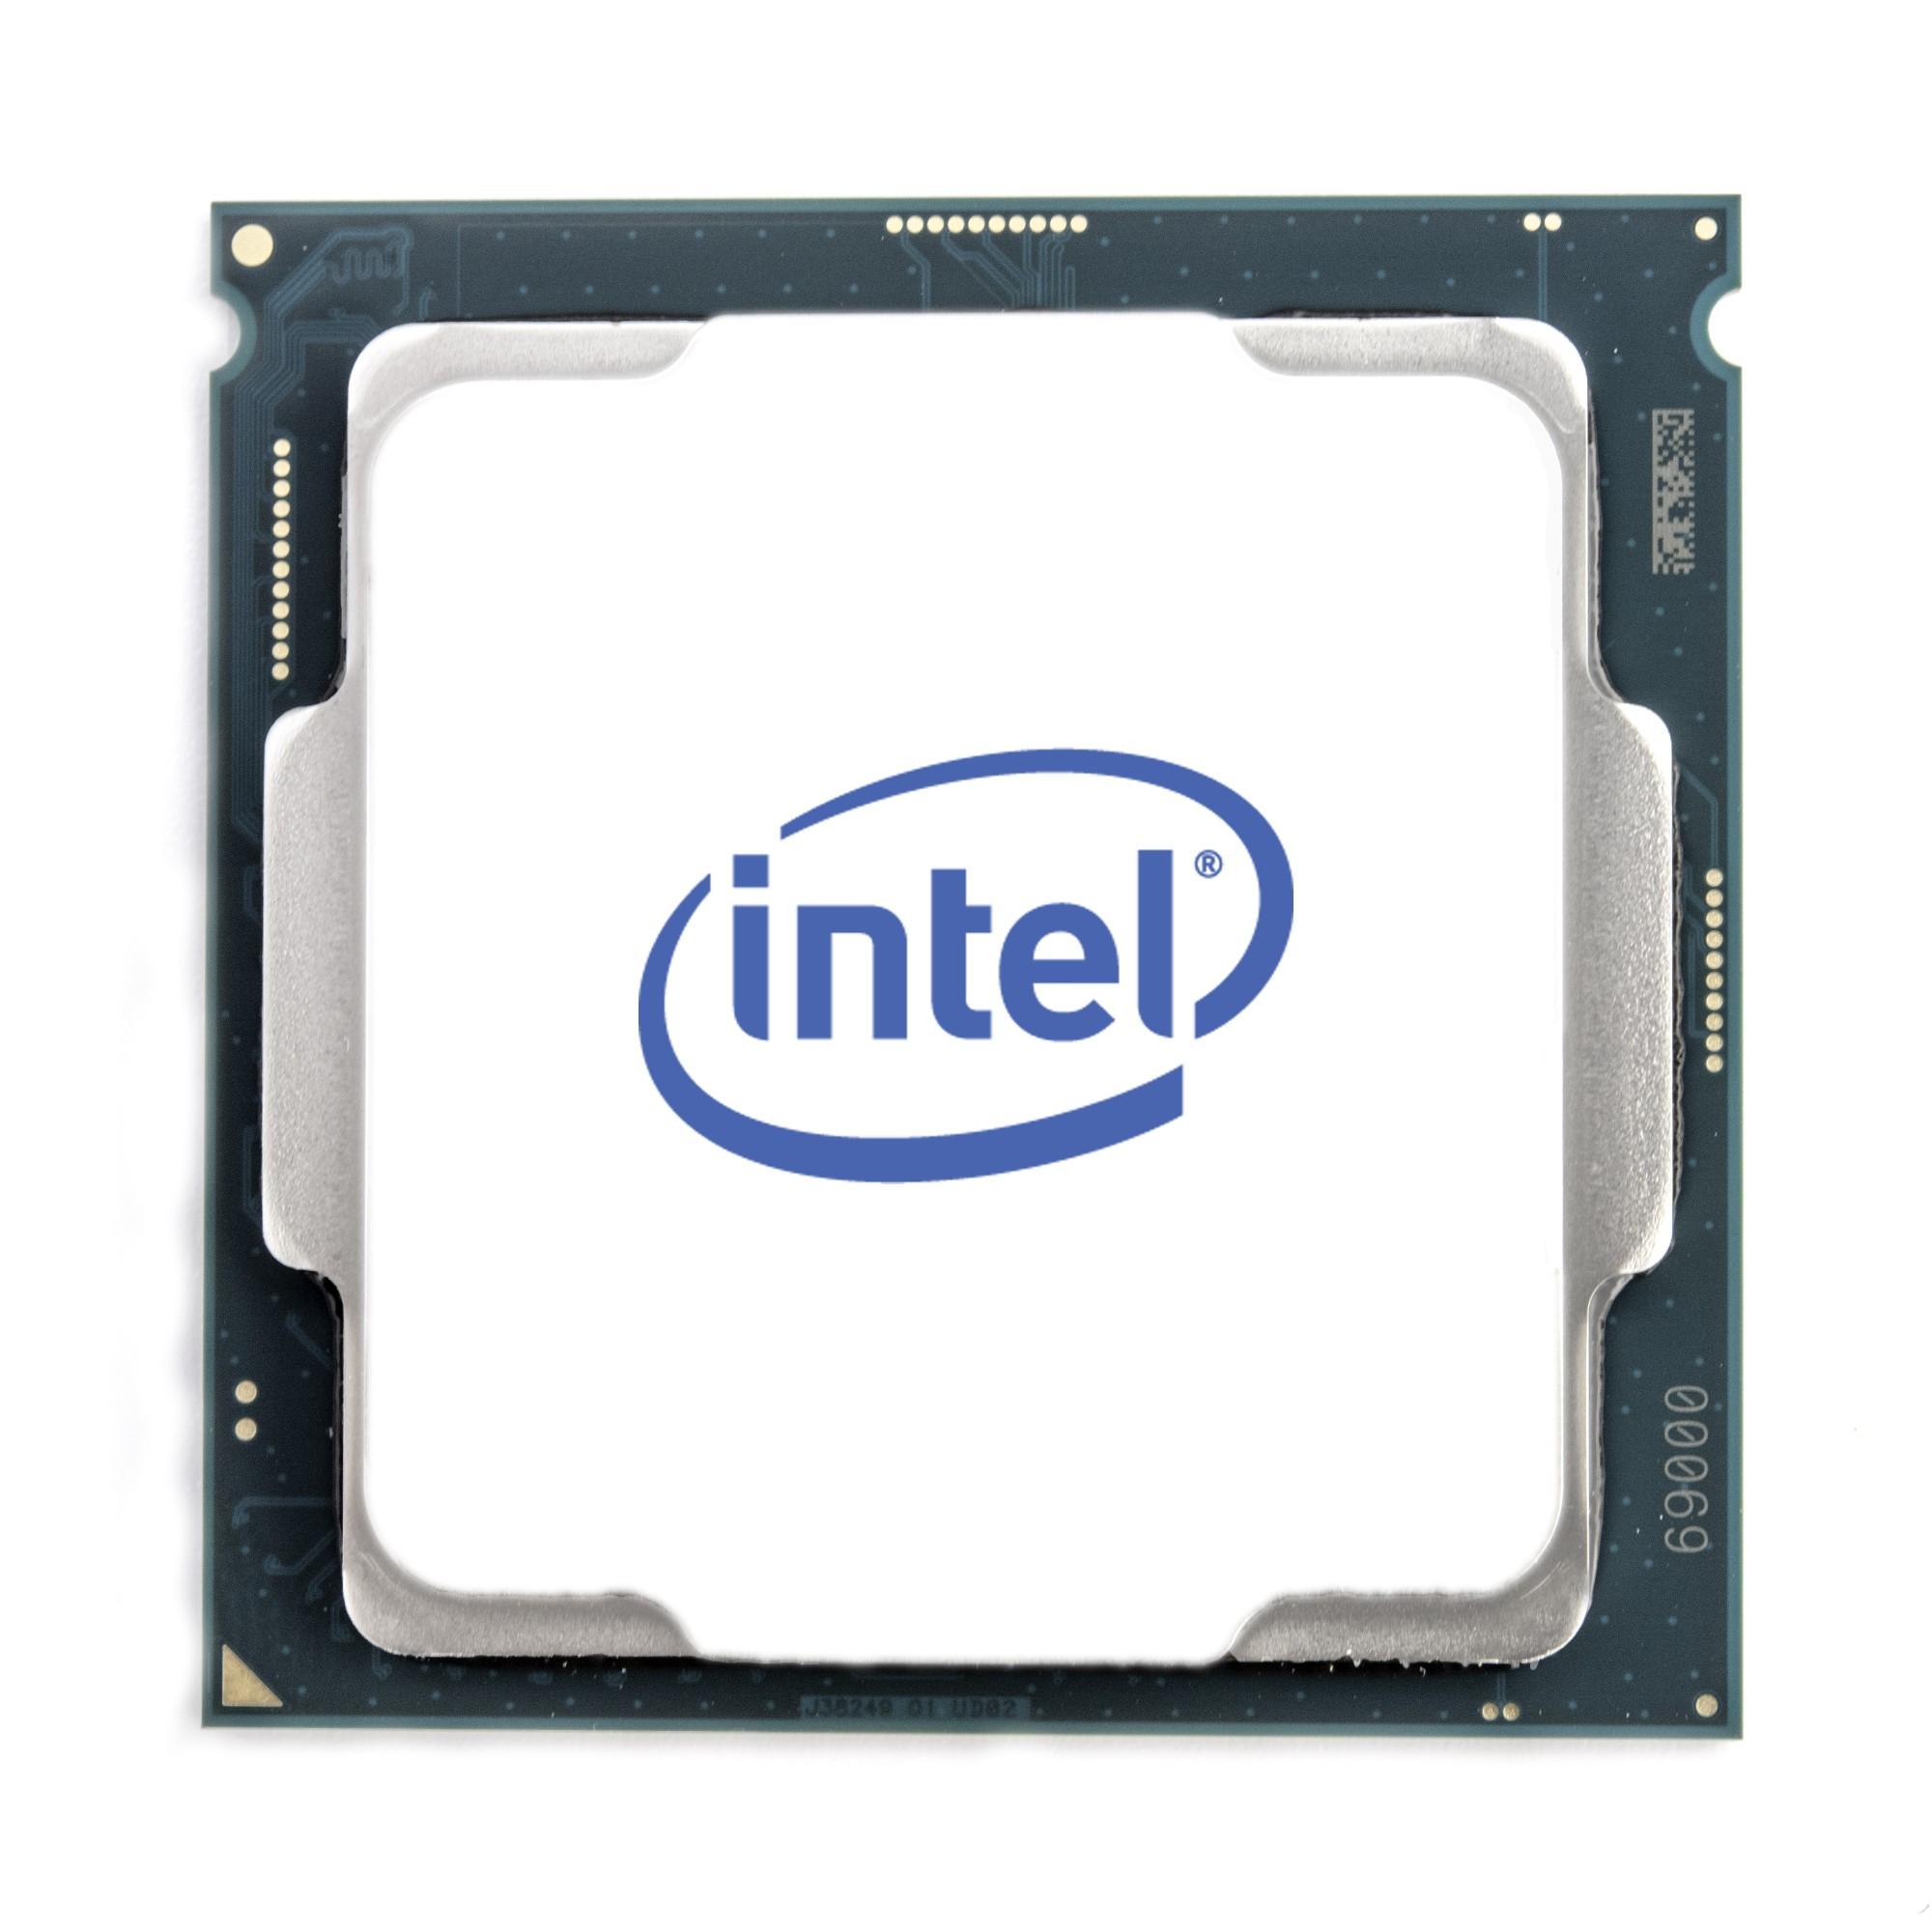 INTEL CELERON G4930 PROCESSOR 3.2 GHZ BOX 2 MB SMART CACHE